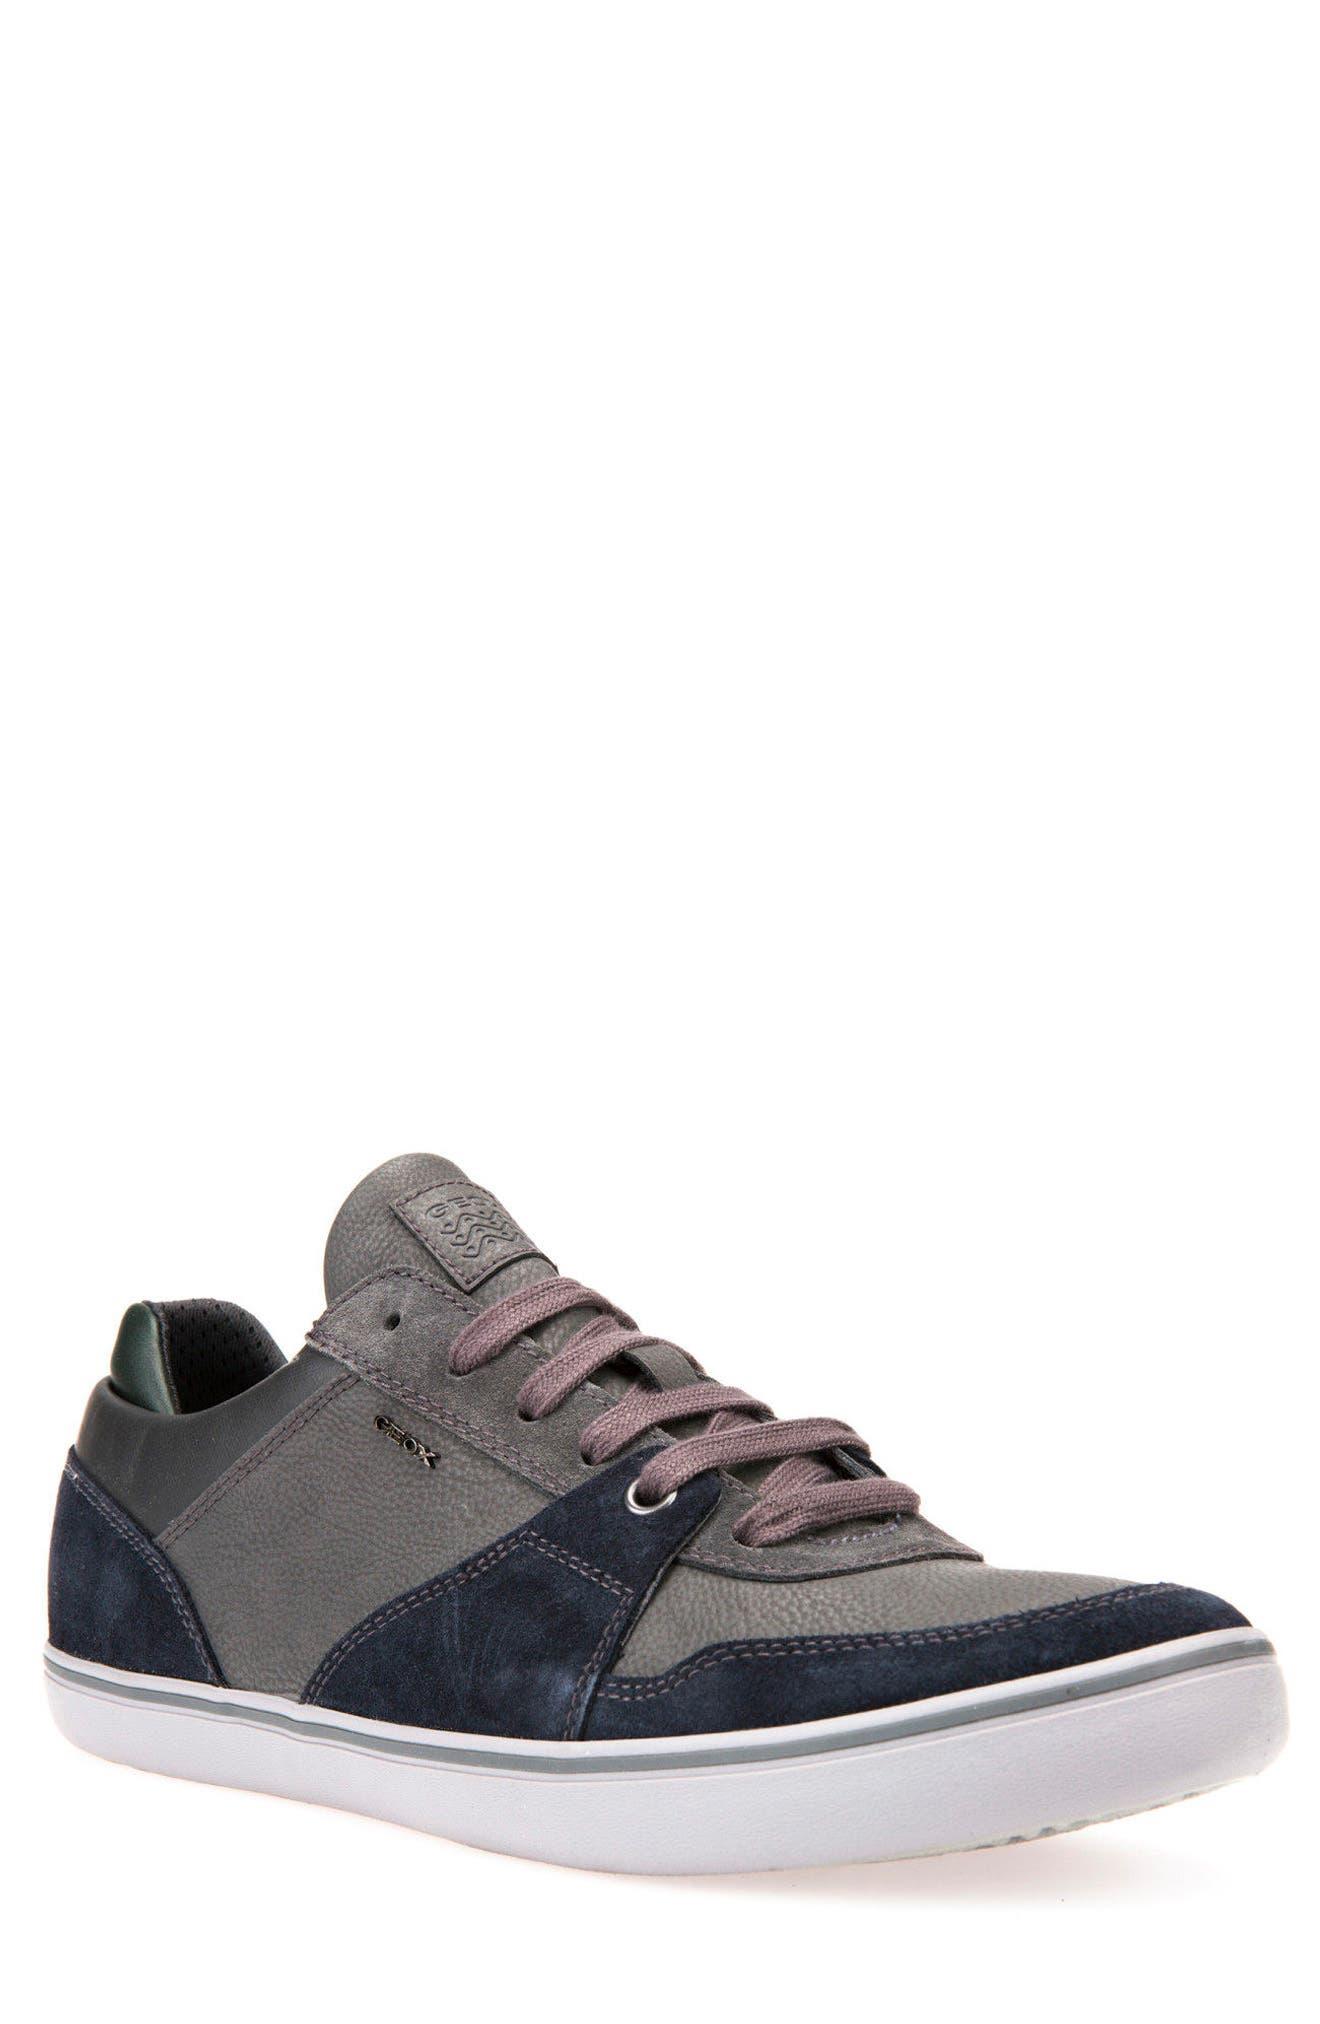 Geox Box 26 Low Top Sneaker (Men)